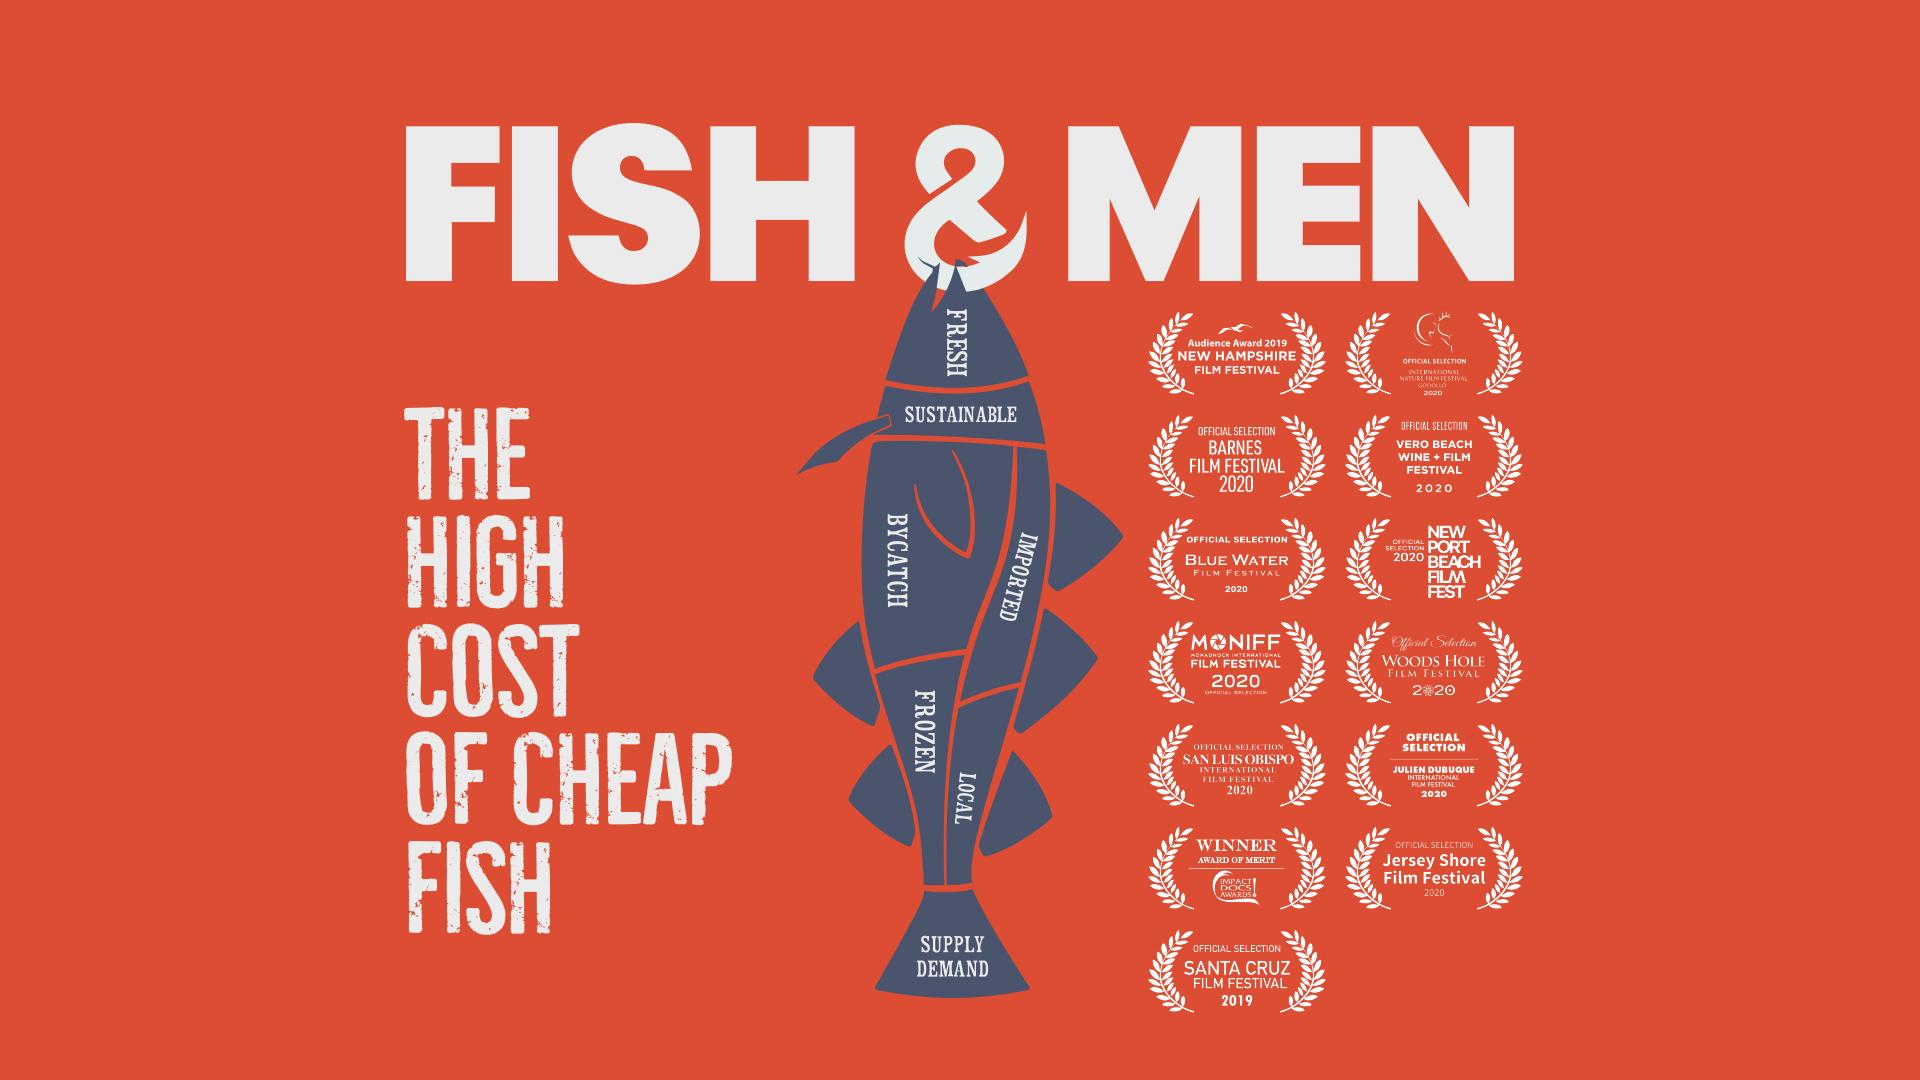 Exclusive: Adam Jones & Darby Duffin Talk About Directing & Producing Fish & Men